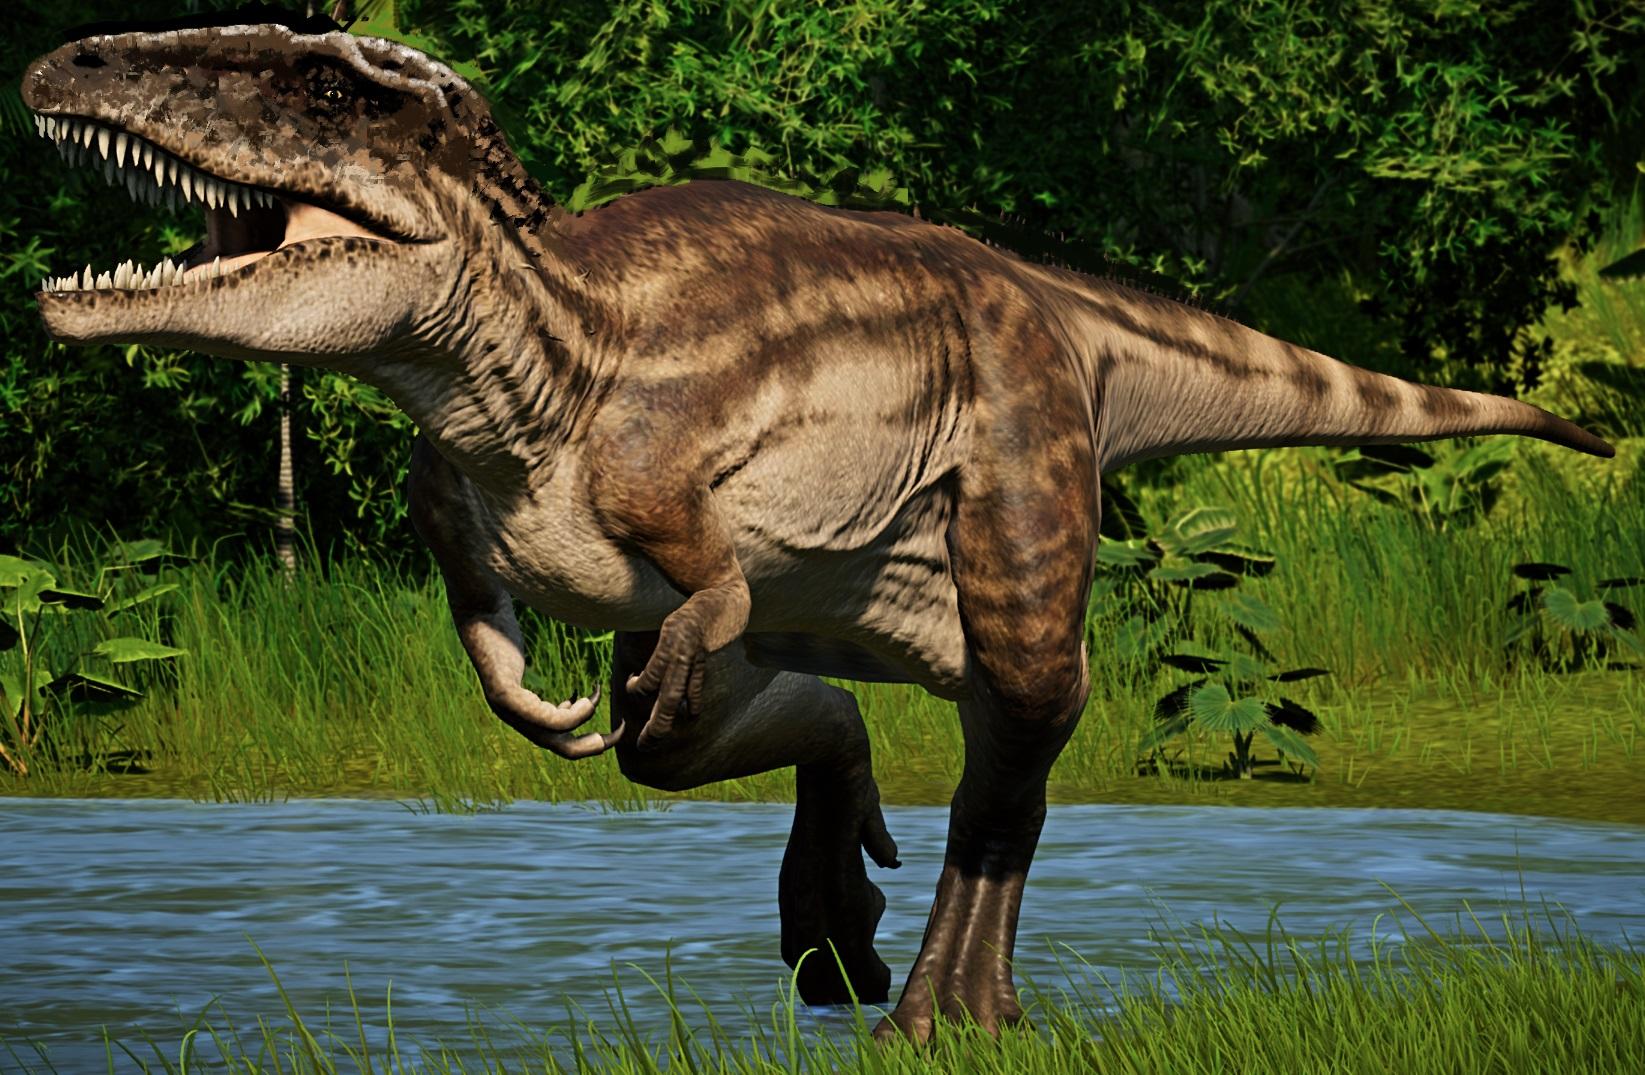 JWECarcharodontosaurus.jpg